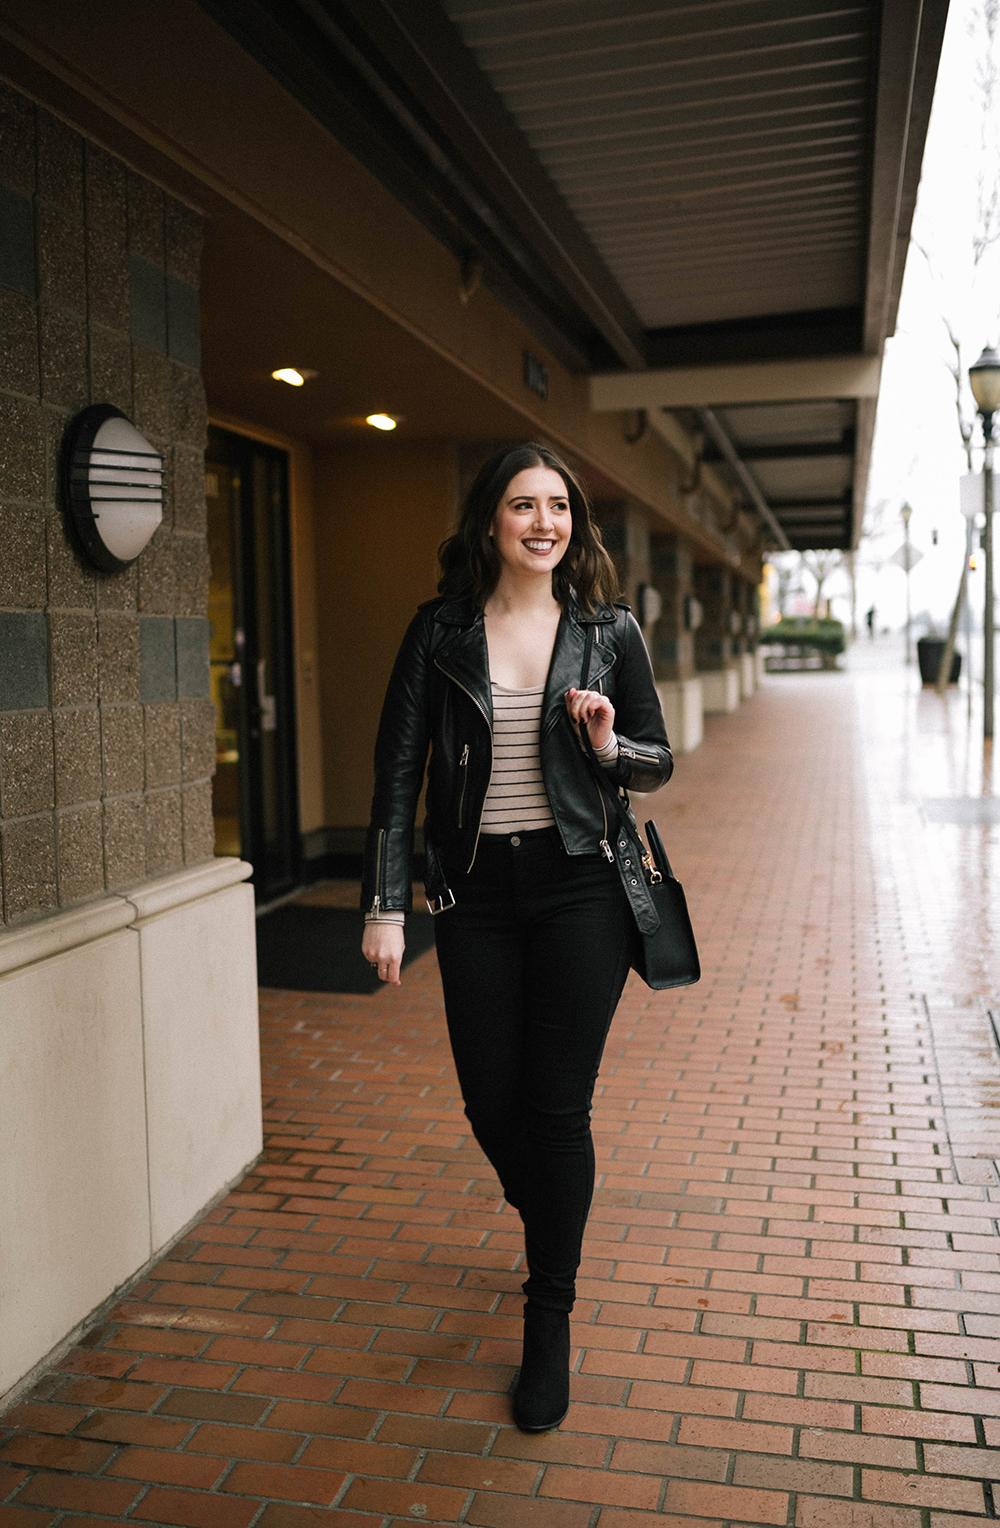 All Saints Balfern Leather Biker Jacket, Madewell Striped Bodysuit - Leather jacket outfit